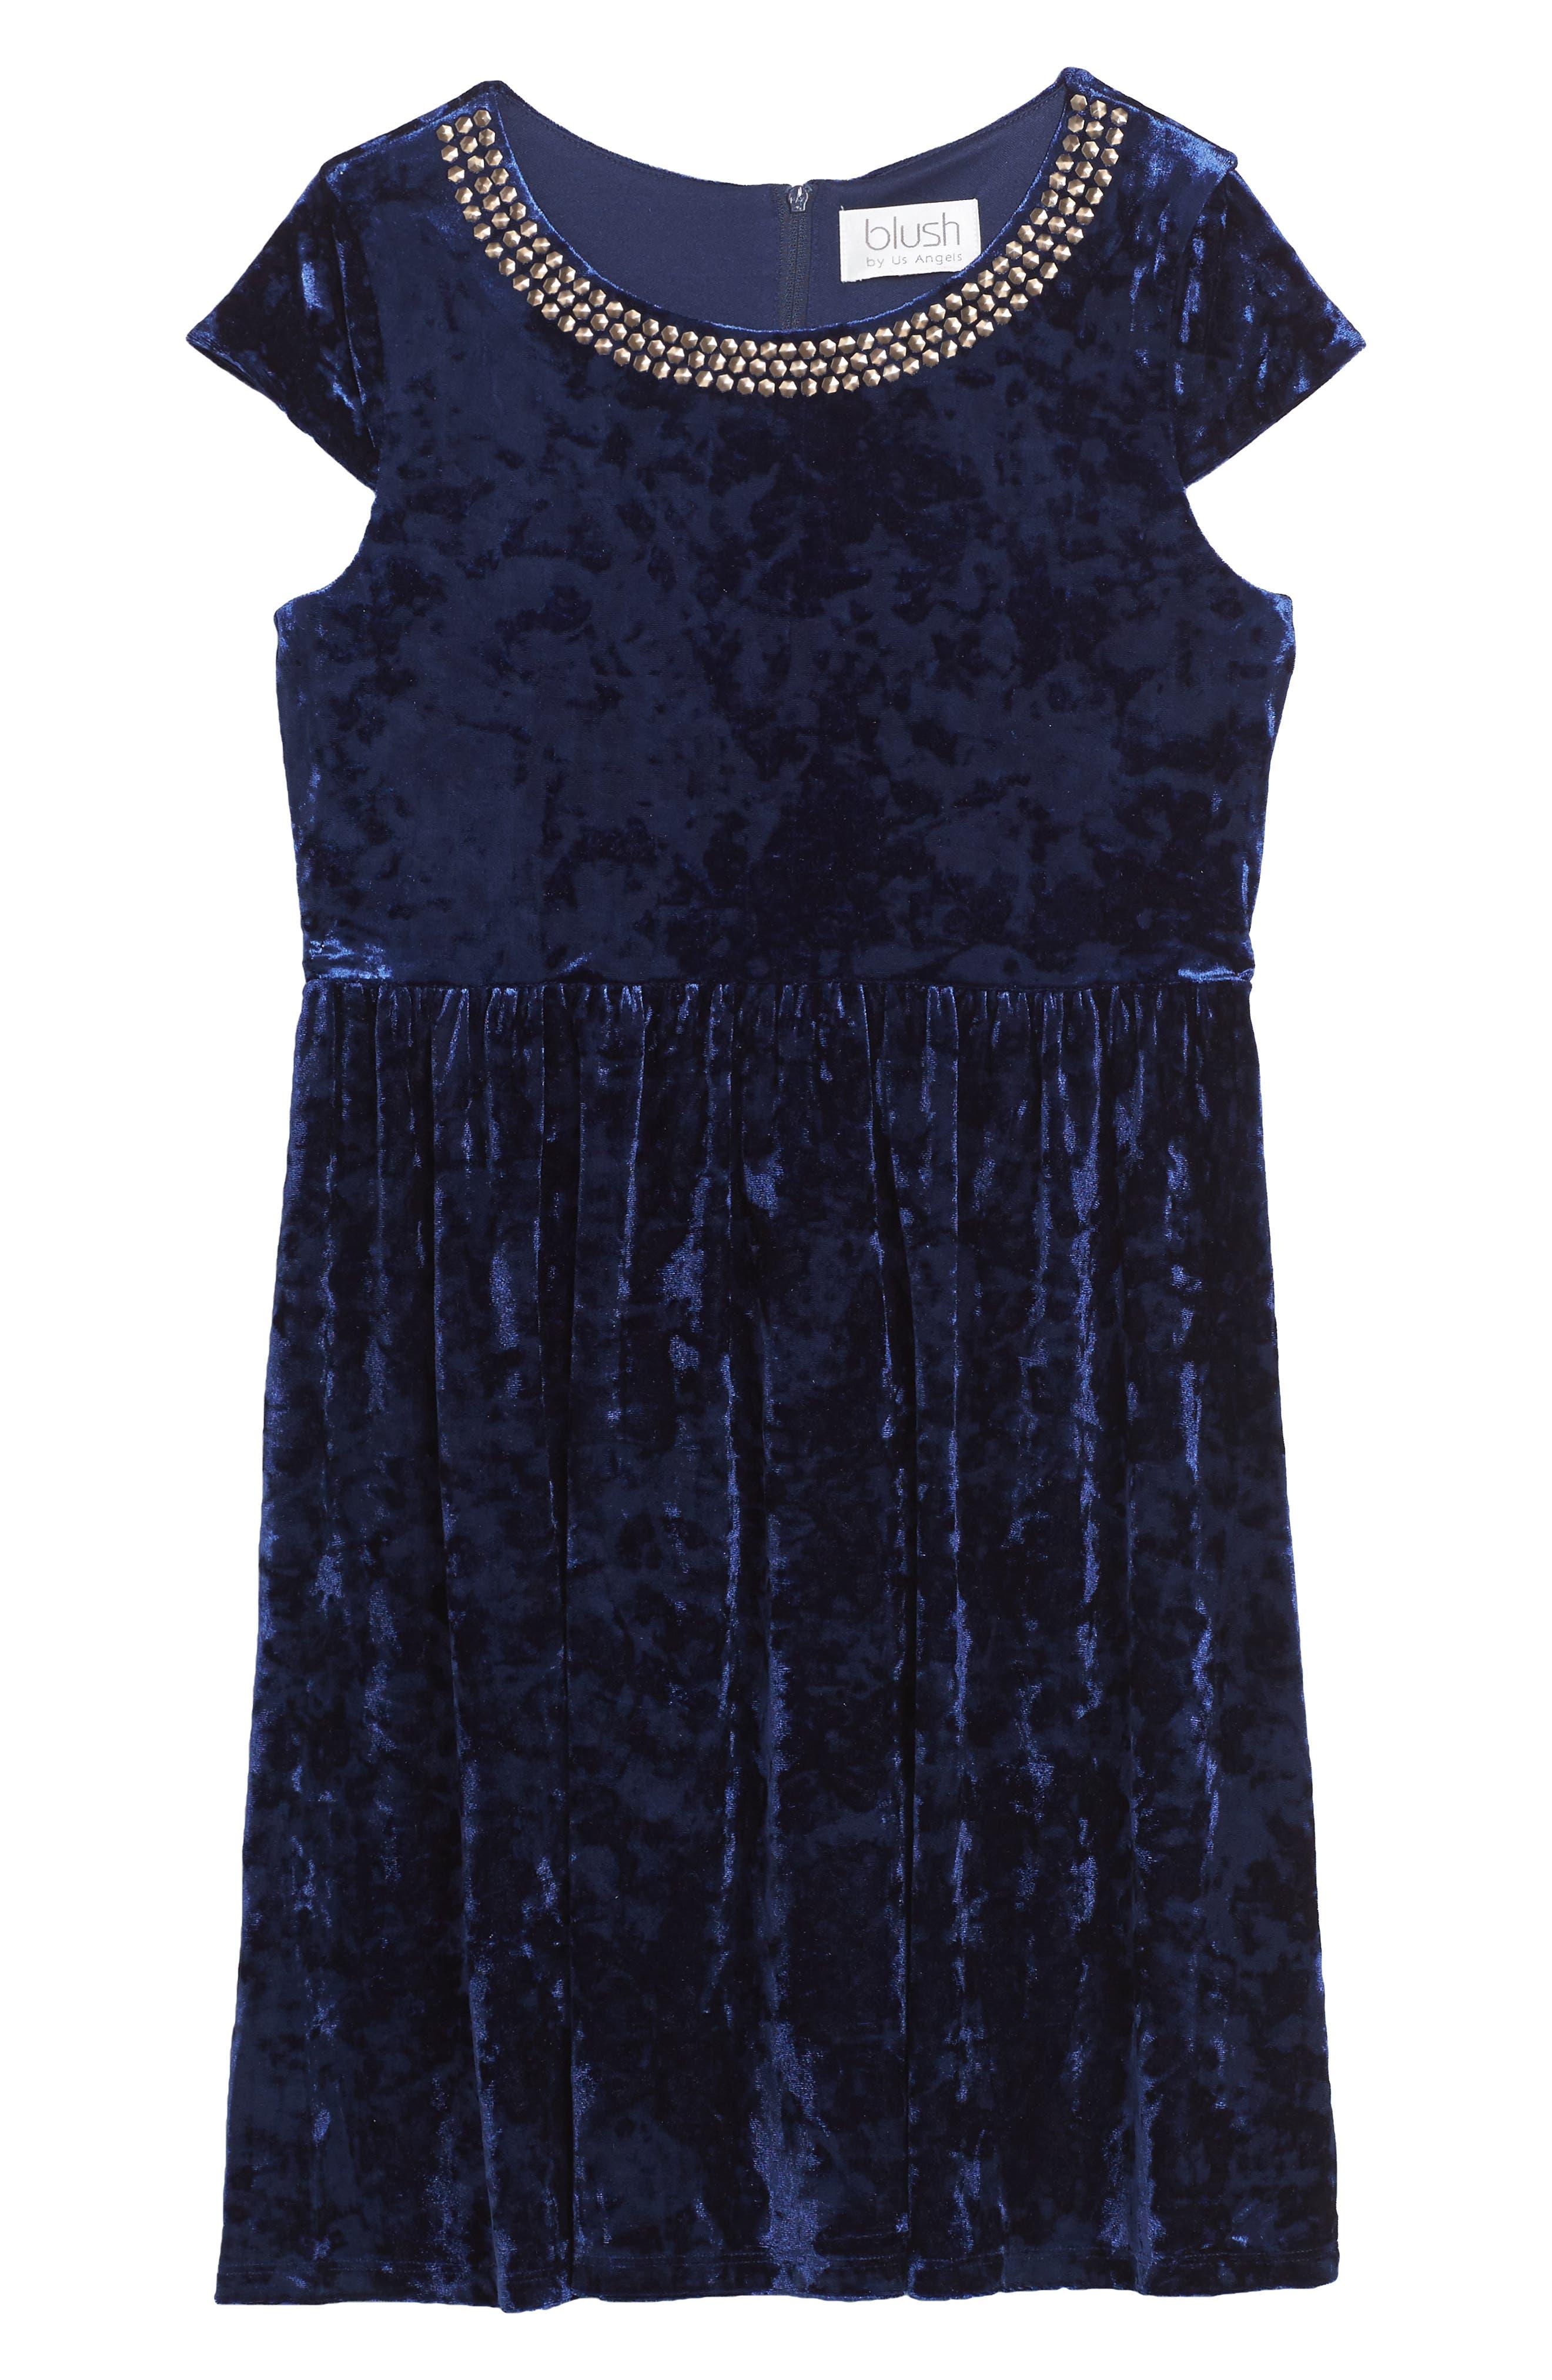 Main Image - BLUSH by Us Angels Velvet Dress (Big Girls)